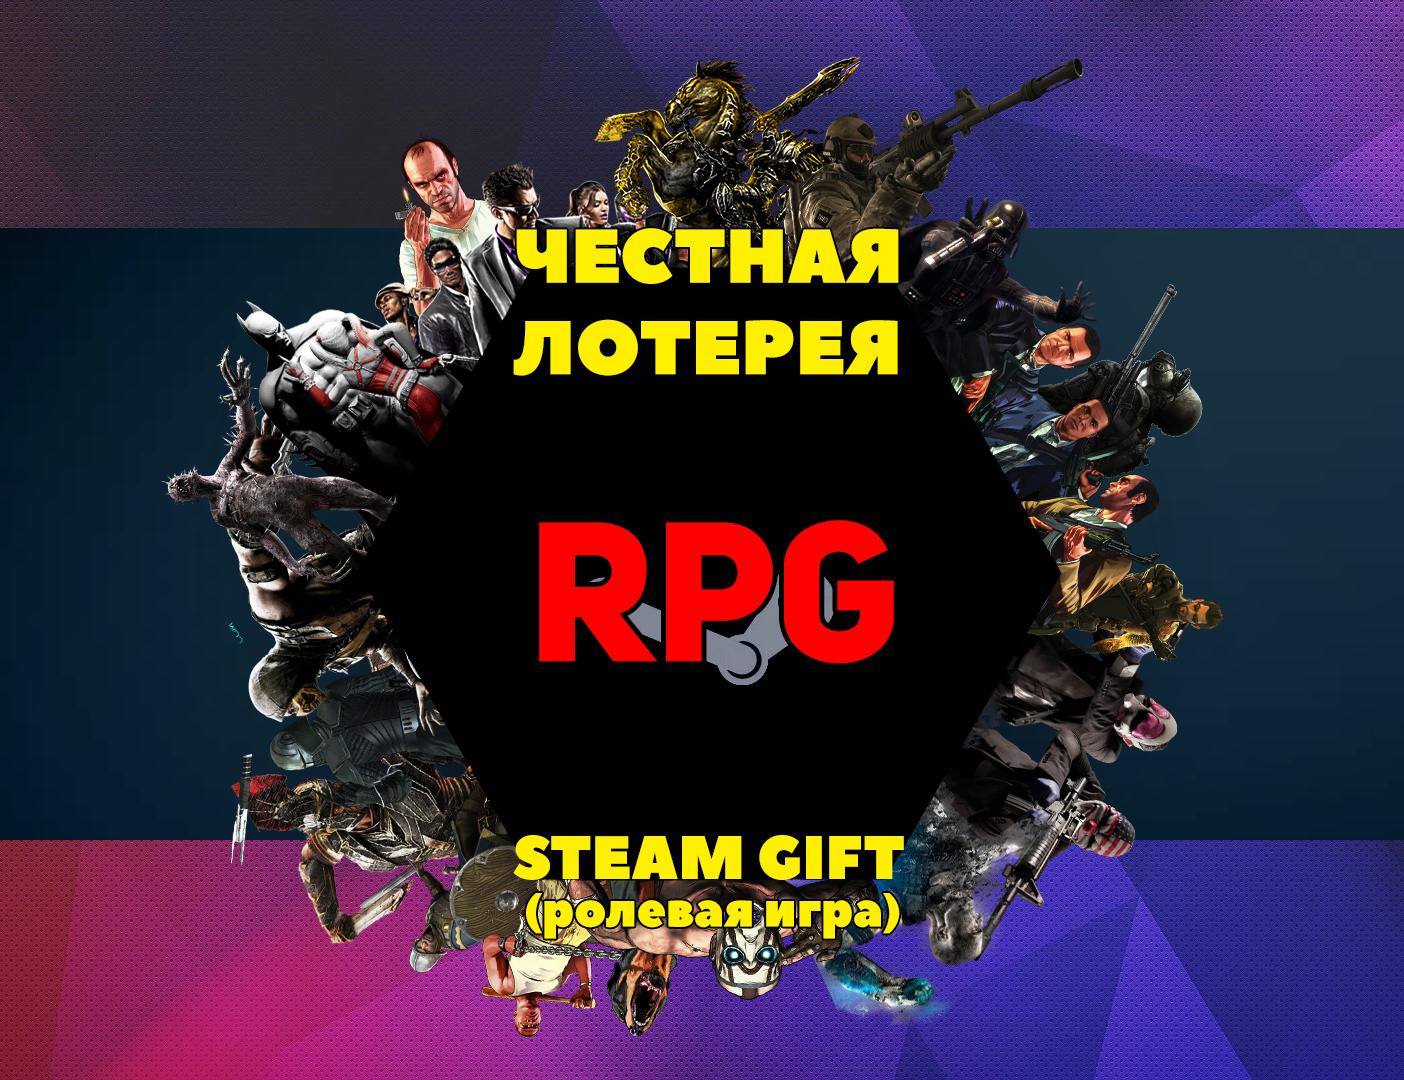 Честная лотерея GIFT Steam [RPG]